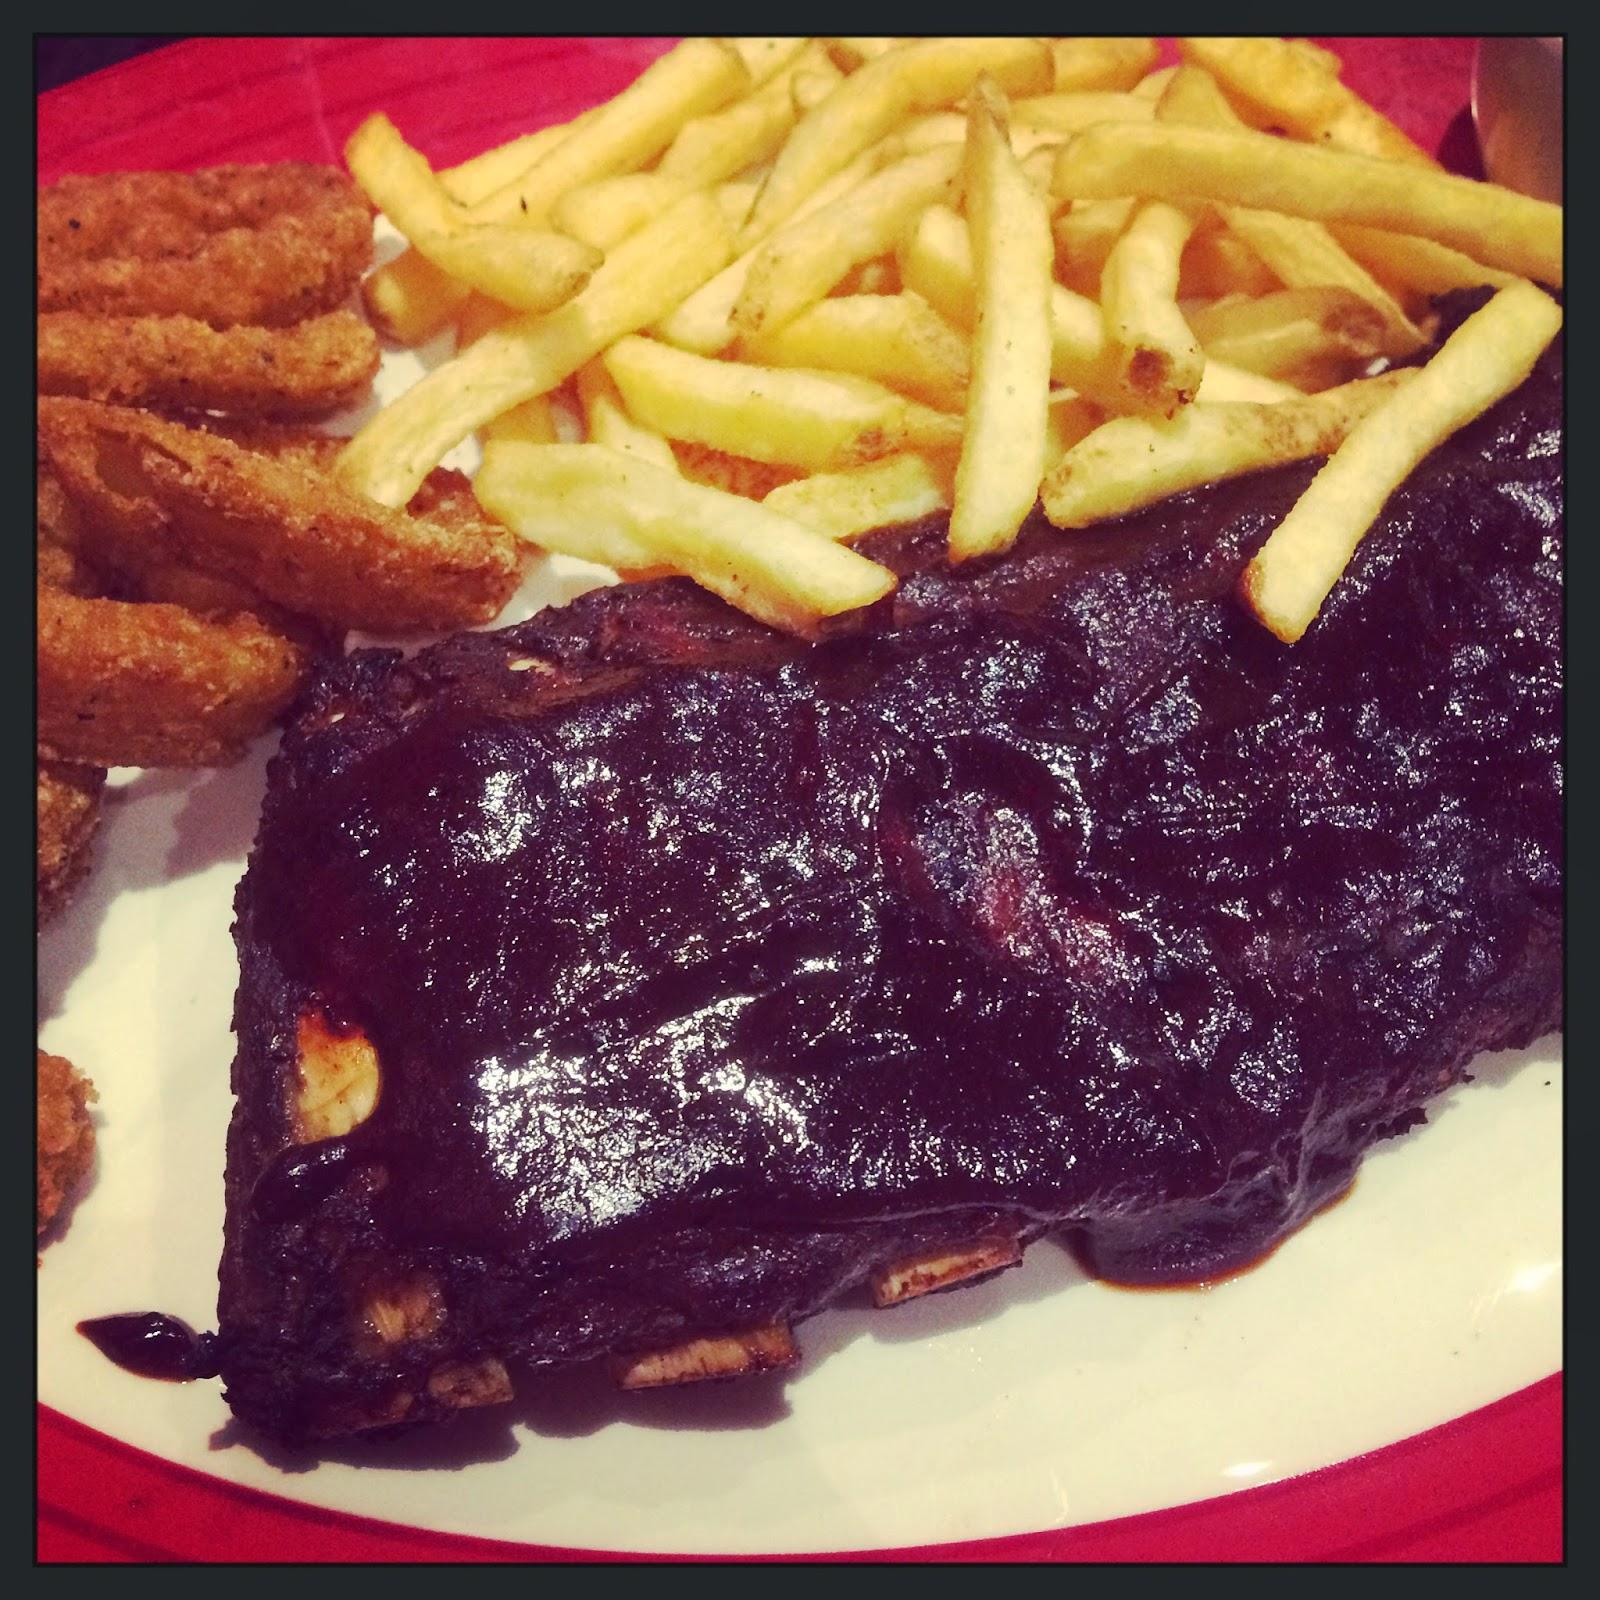 TGI Friday's BBQ ribs